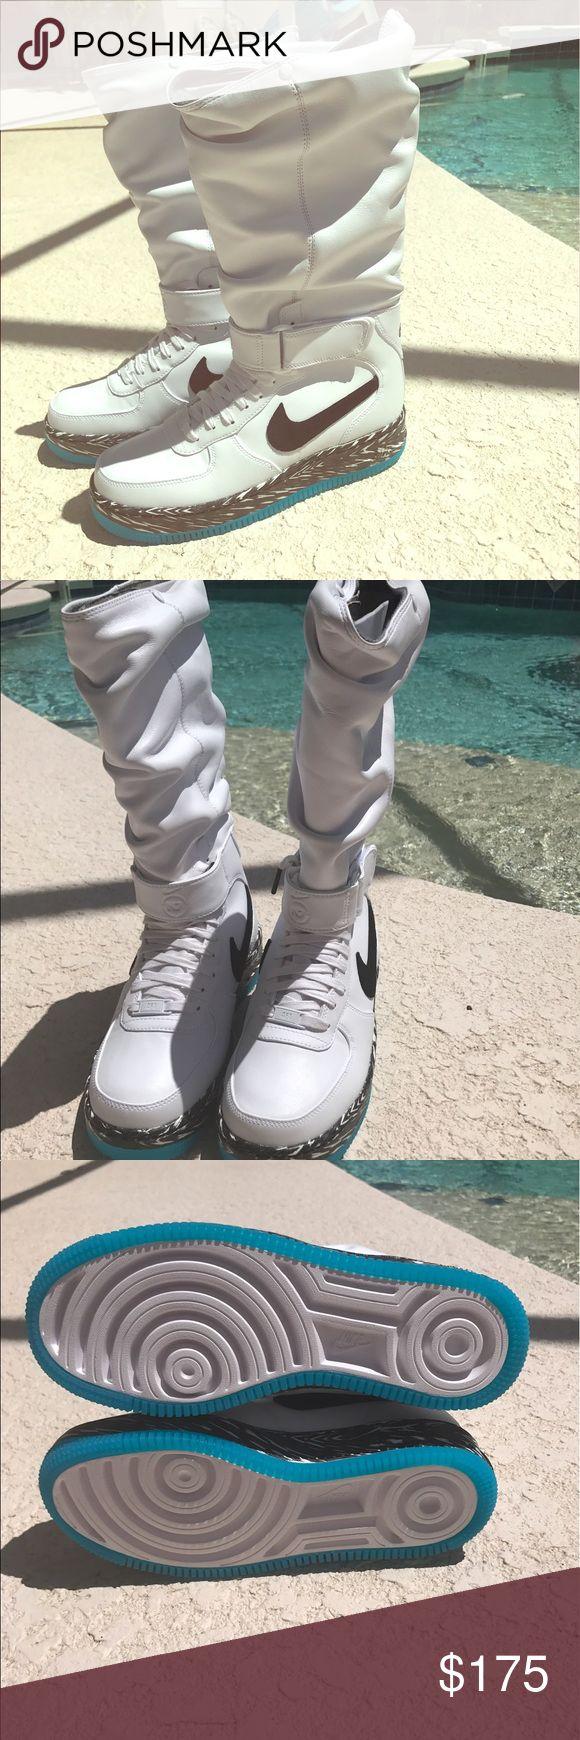 best sneakers 12b0e b8218 nike air force 1 upstep warrior n7 christmas